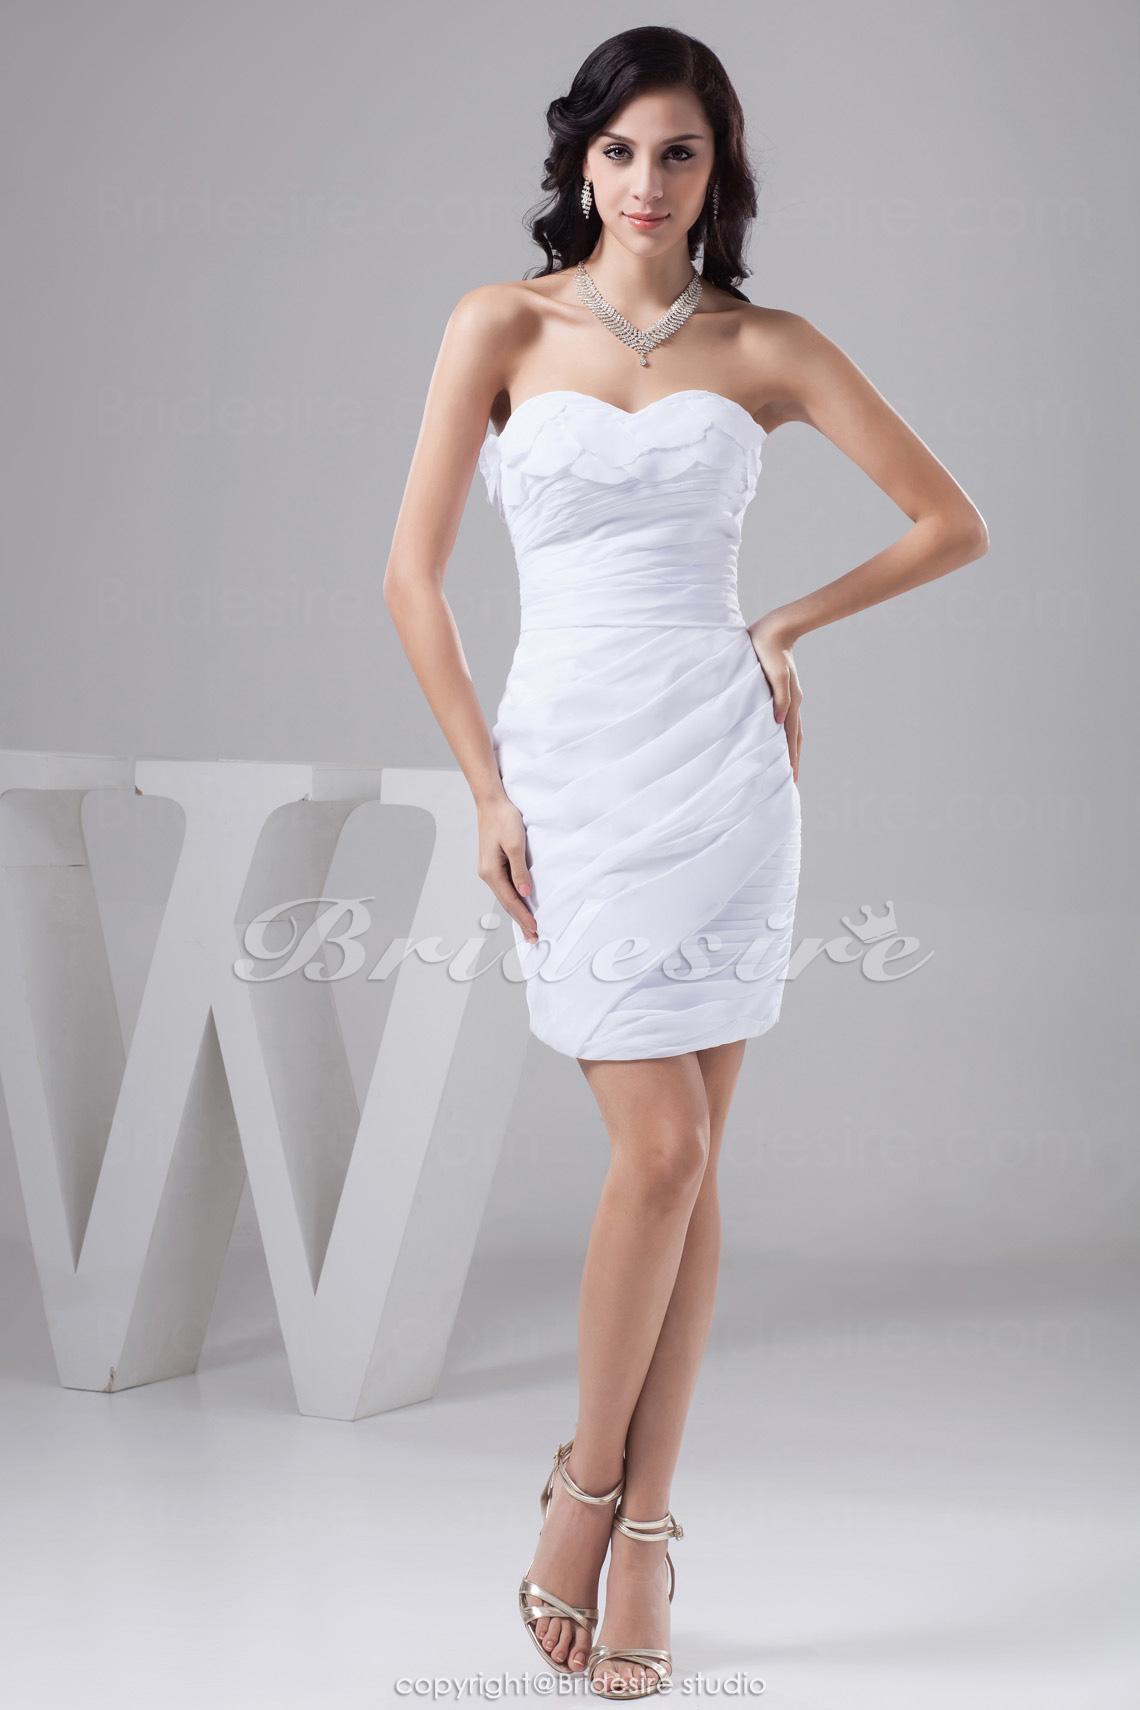 bc66e7bc89c Bridesire - Etui-Linie Herz-Ausschnitt Kurz Mini ärmellos Taft Kleid   BD41156  - €74.27   Bridesire